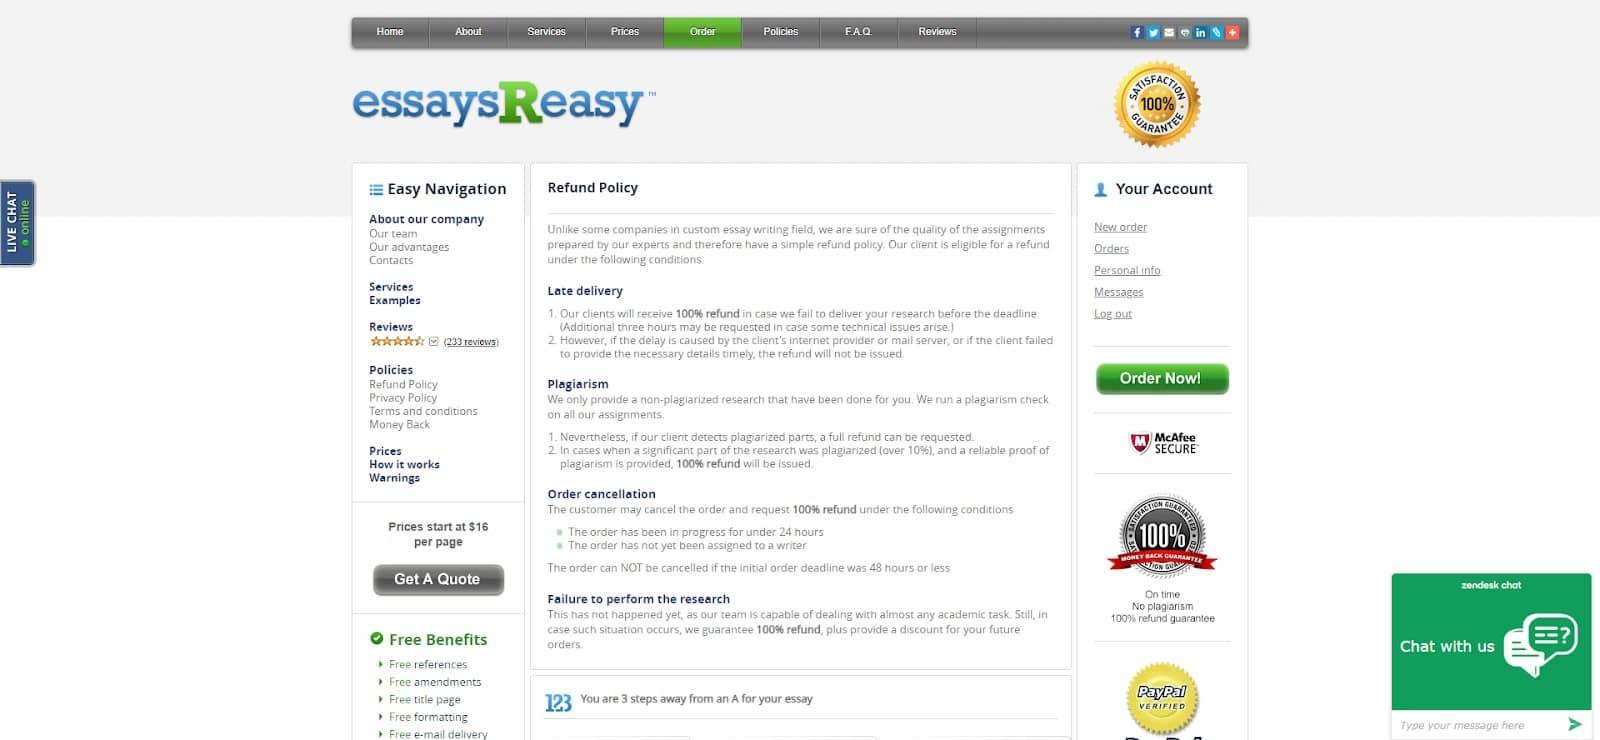 essaysreasy.com